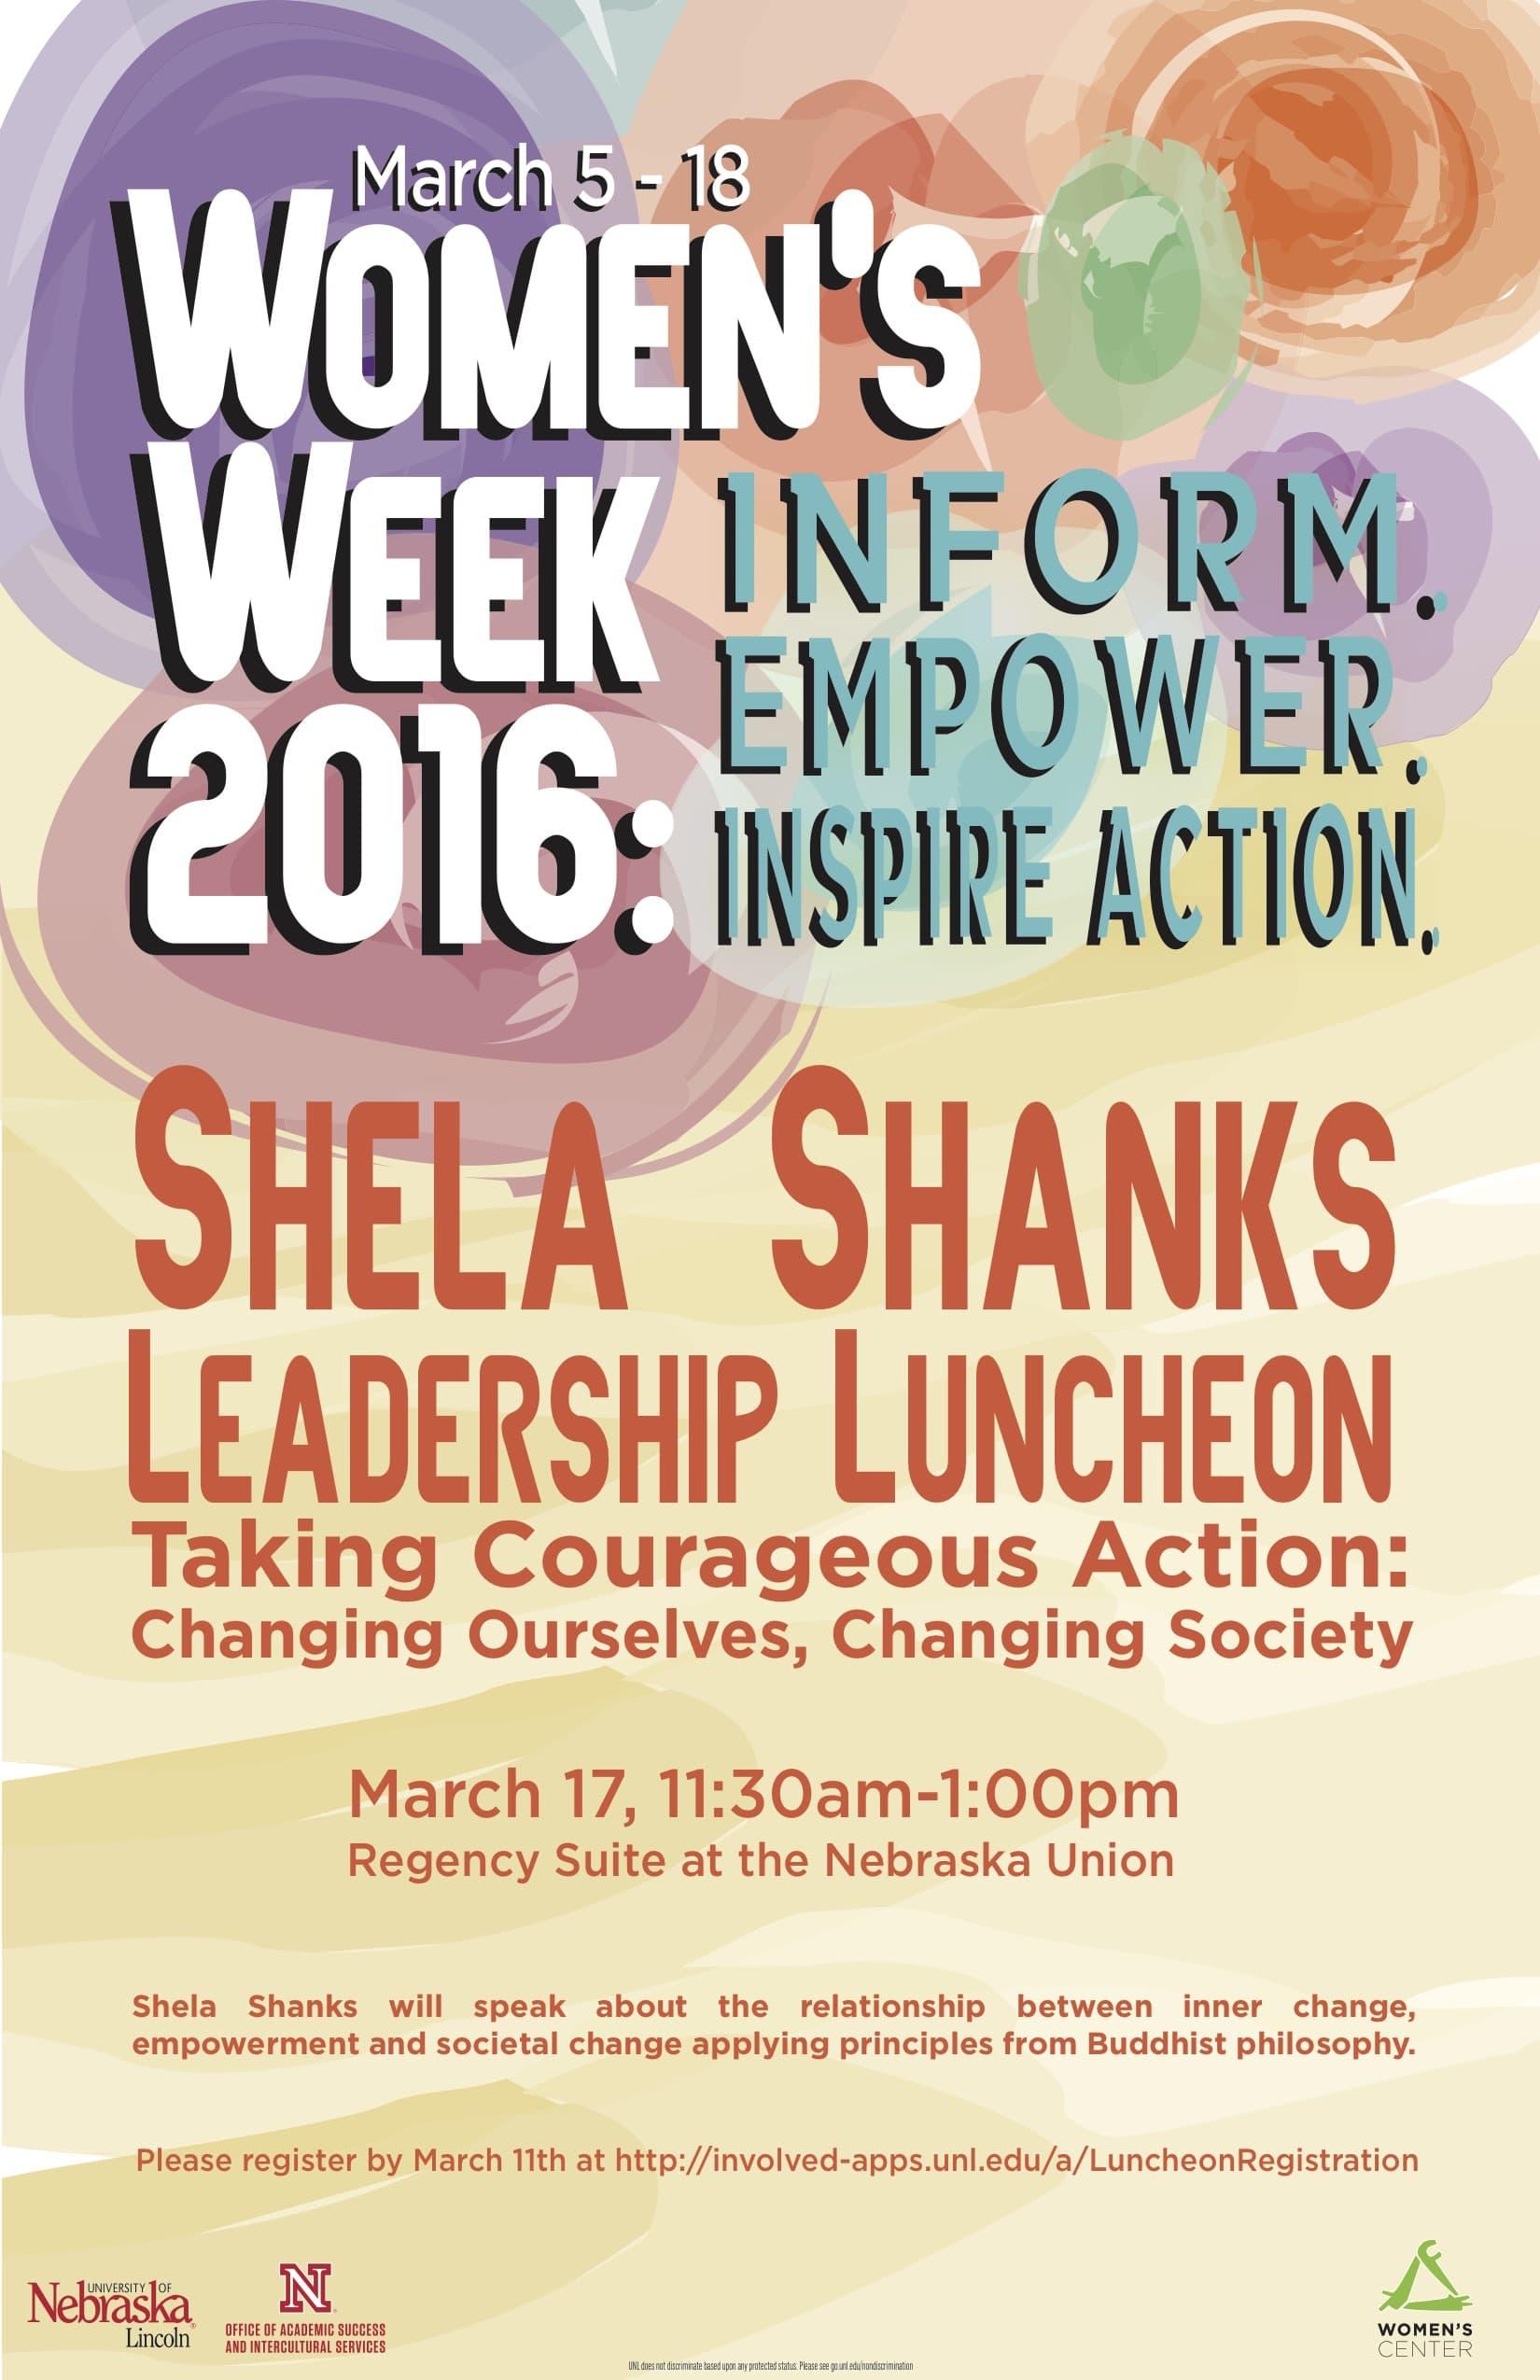 Shela Shanks Luncheon